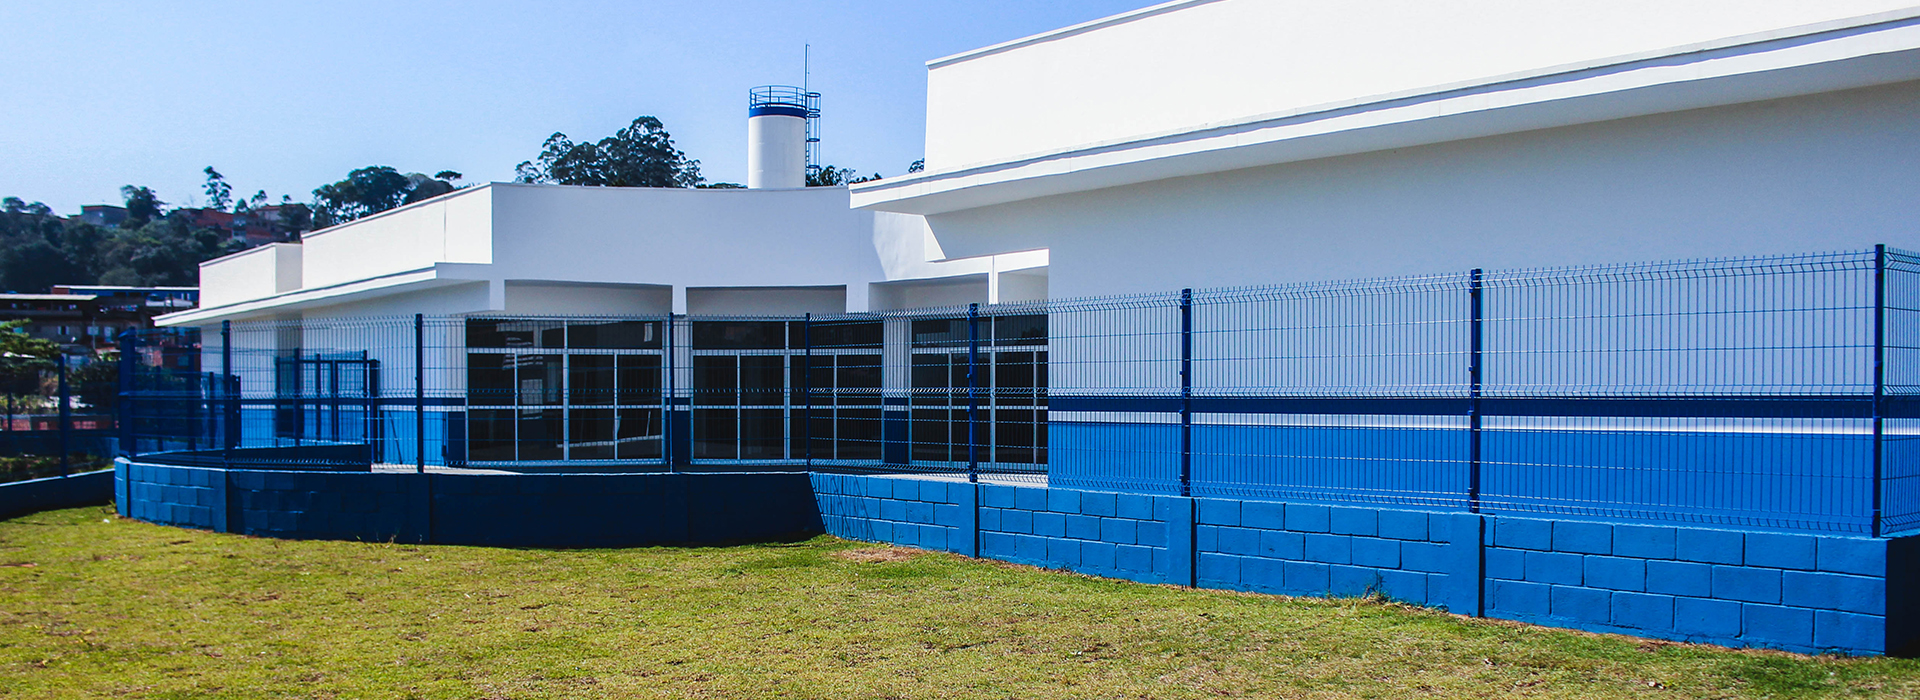 Igreja Matriz de Santana de Parnaíba